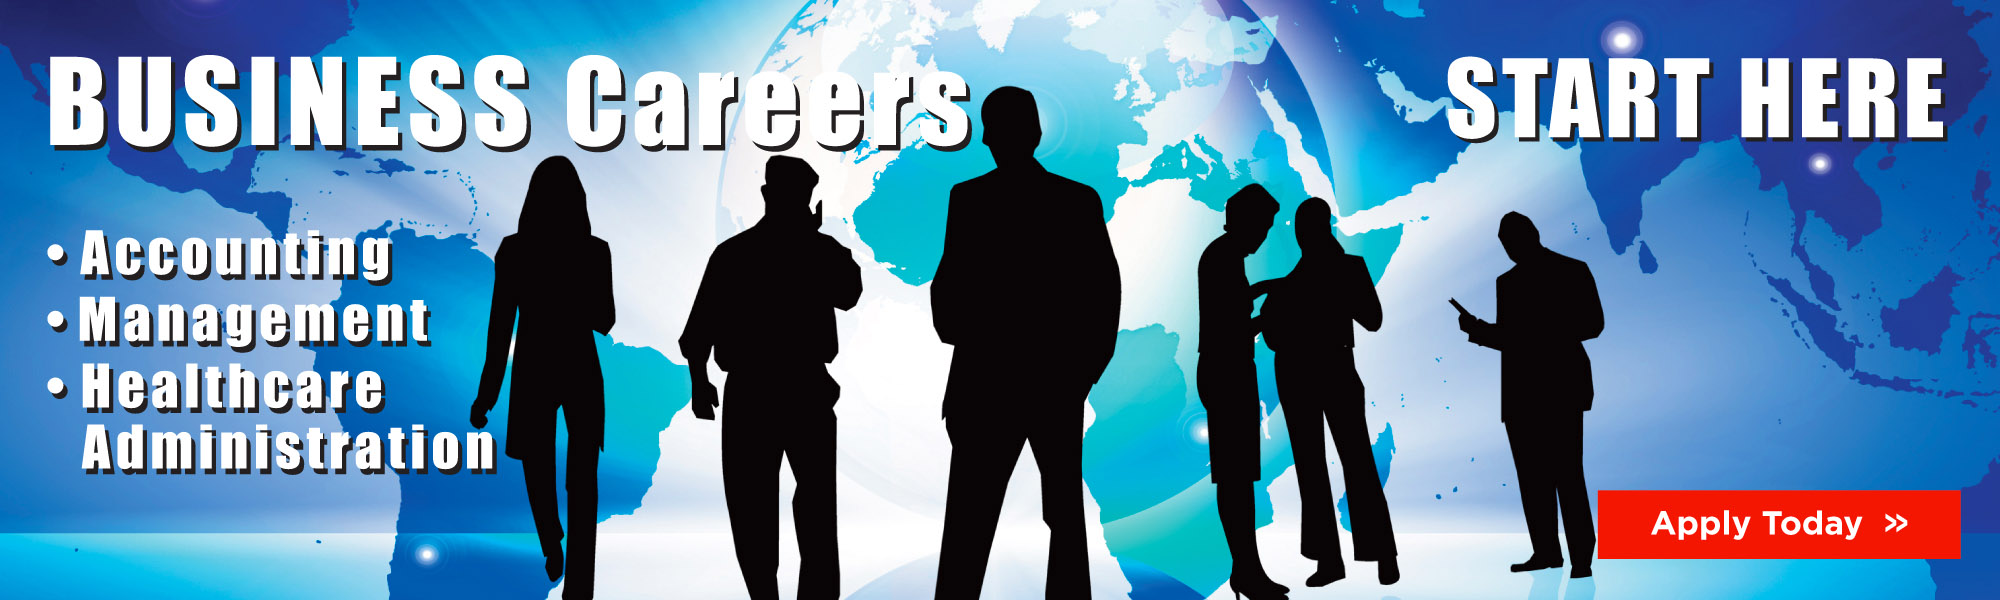 Business Careers